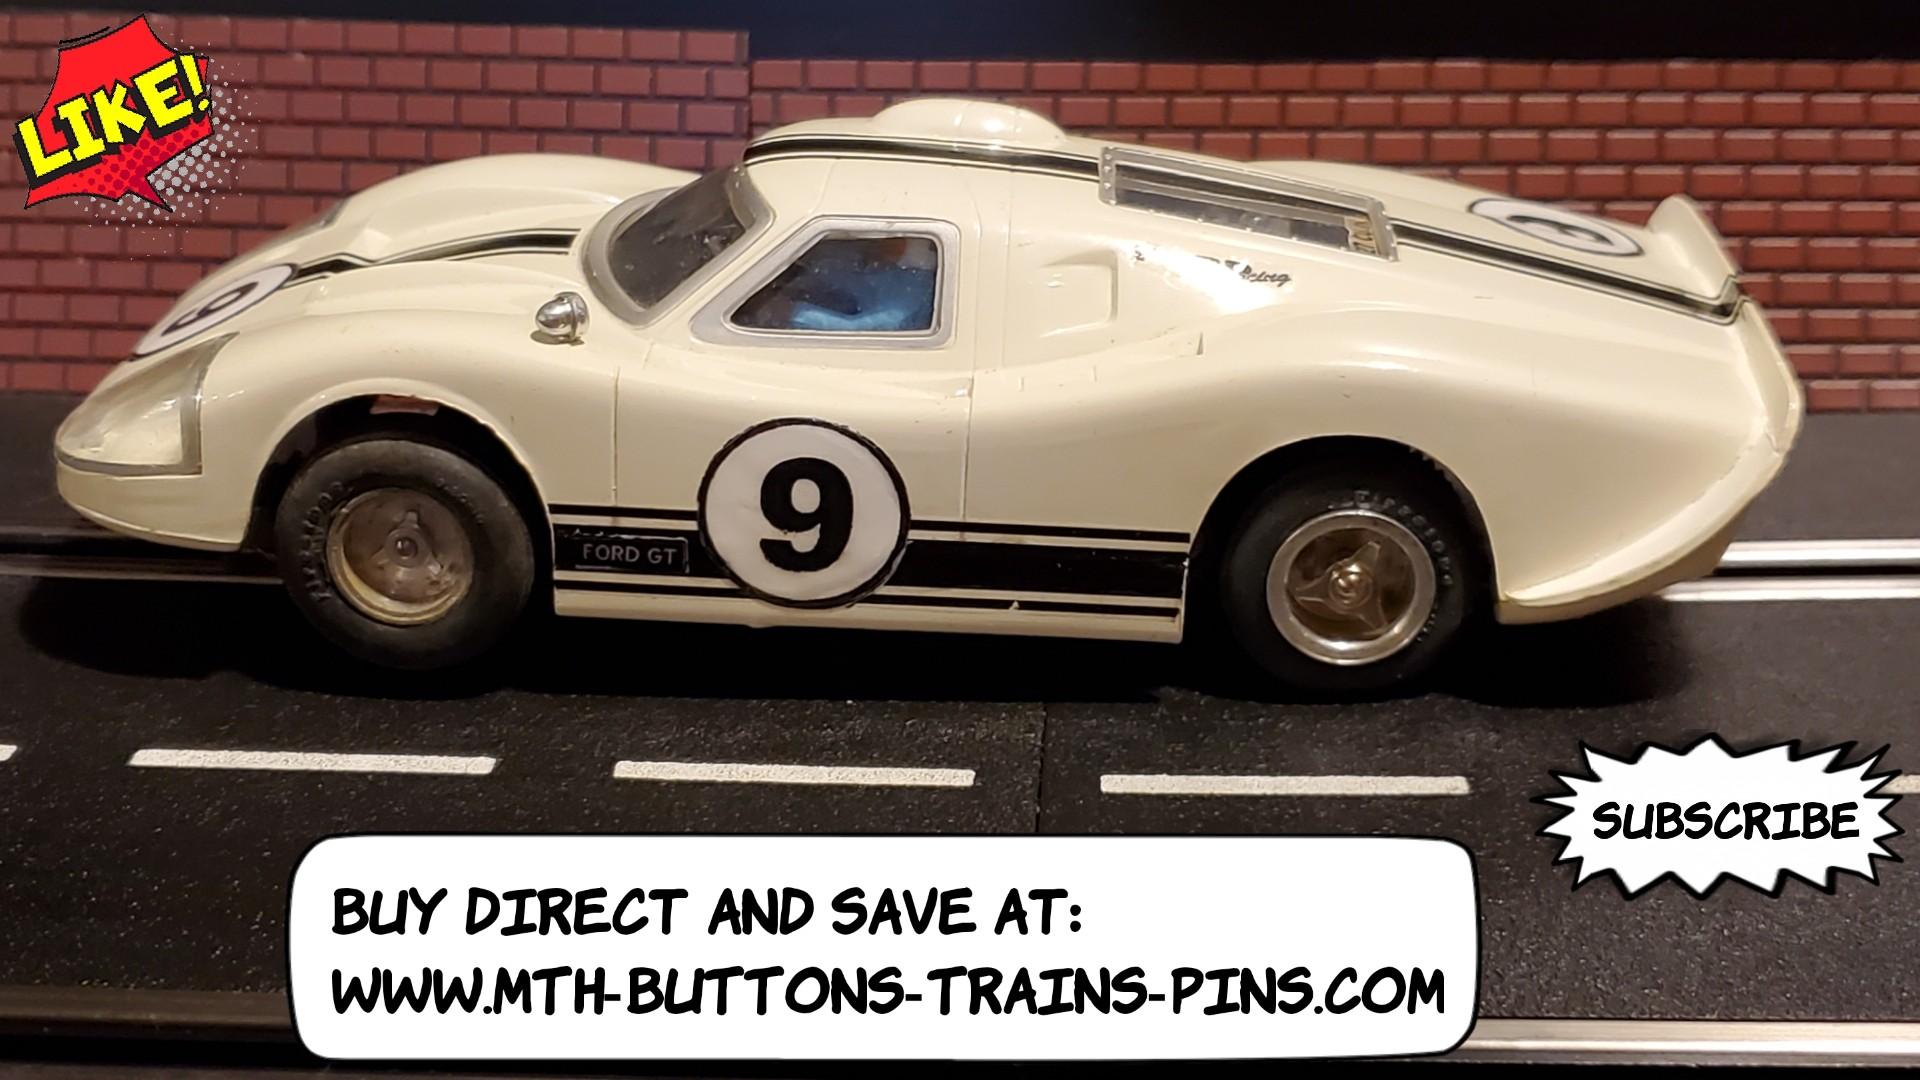 * SALE * VERY RARE 1967 Ford GT40 Mark 4 (MkIV) LeMans Spec Slot Car 1:24 Scale – Car 9